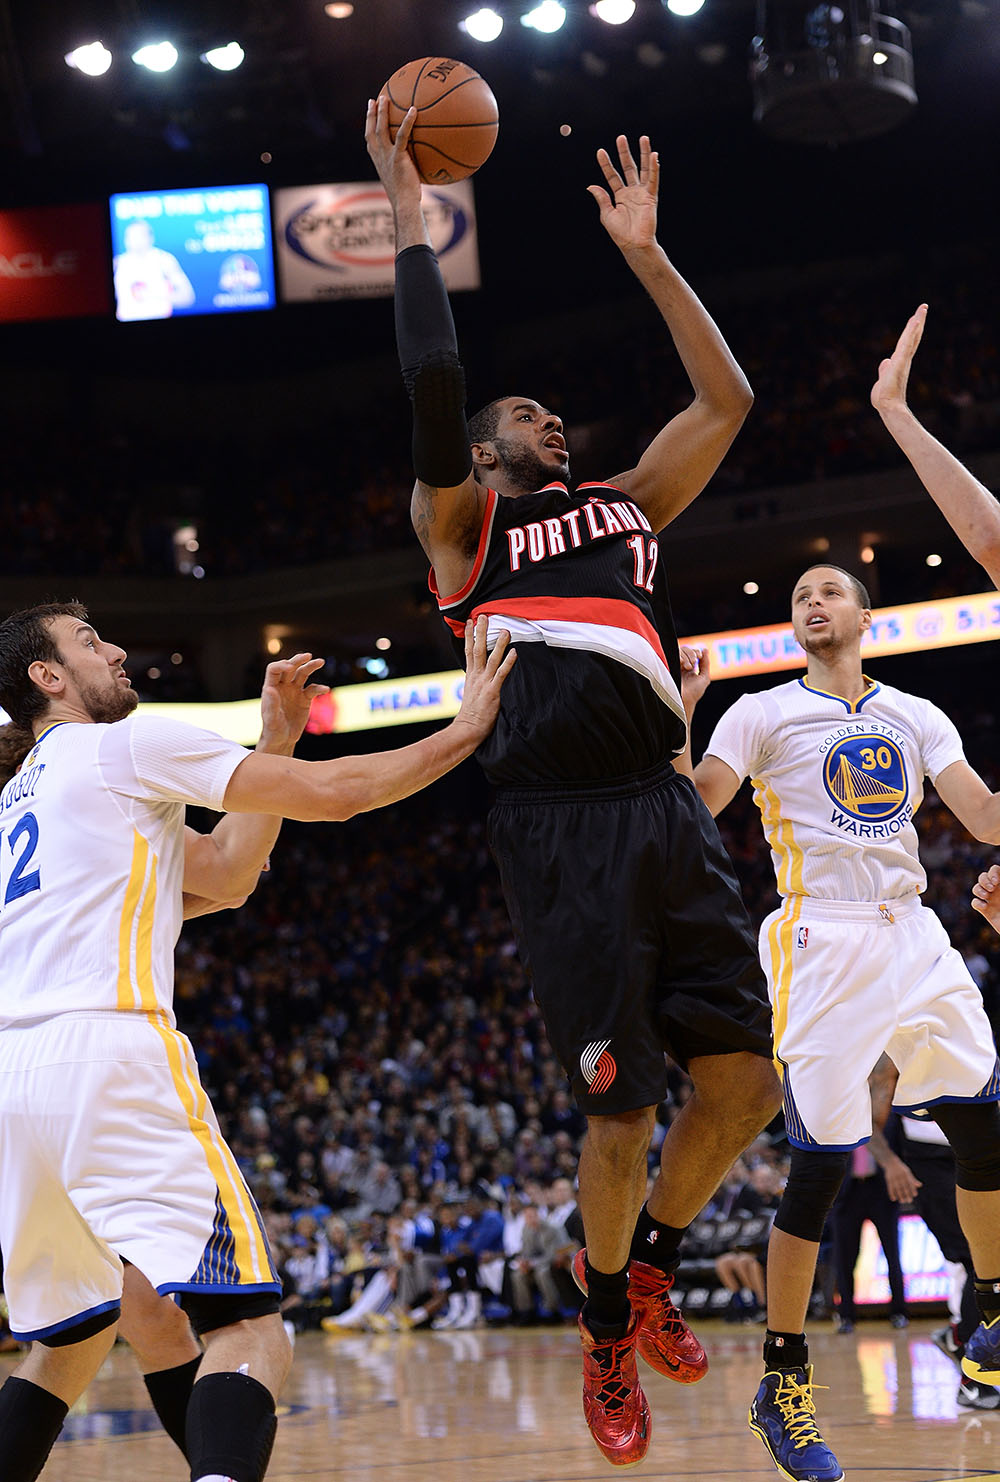 Portland Trail Blazers v Golden State Warriors con LaMarcus Aldridge y viva basquet